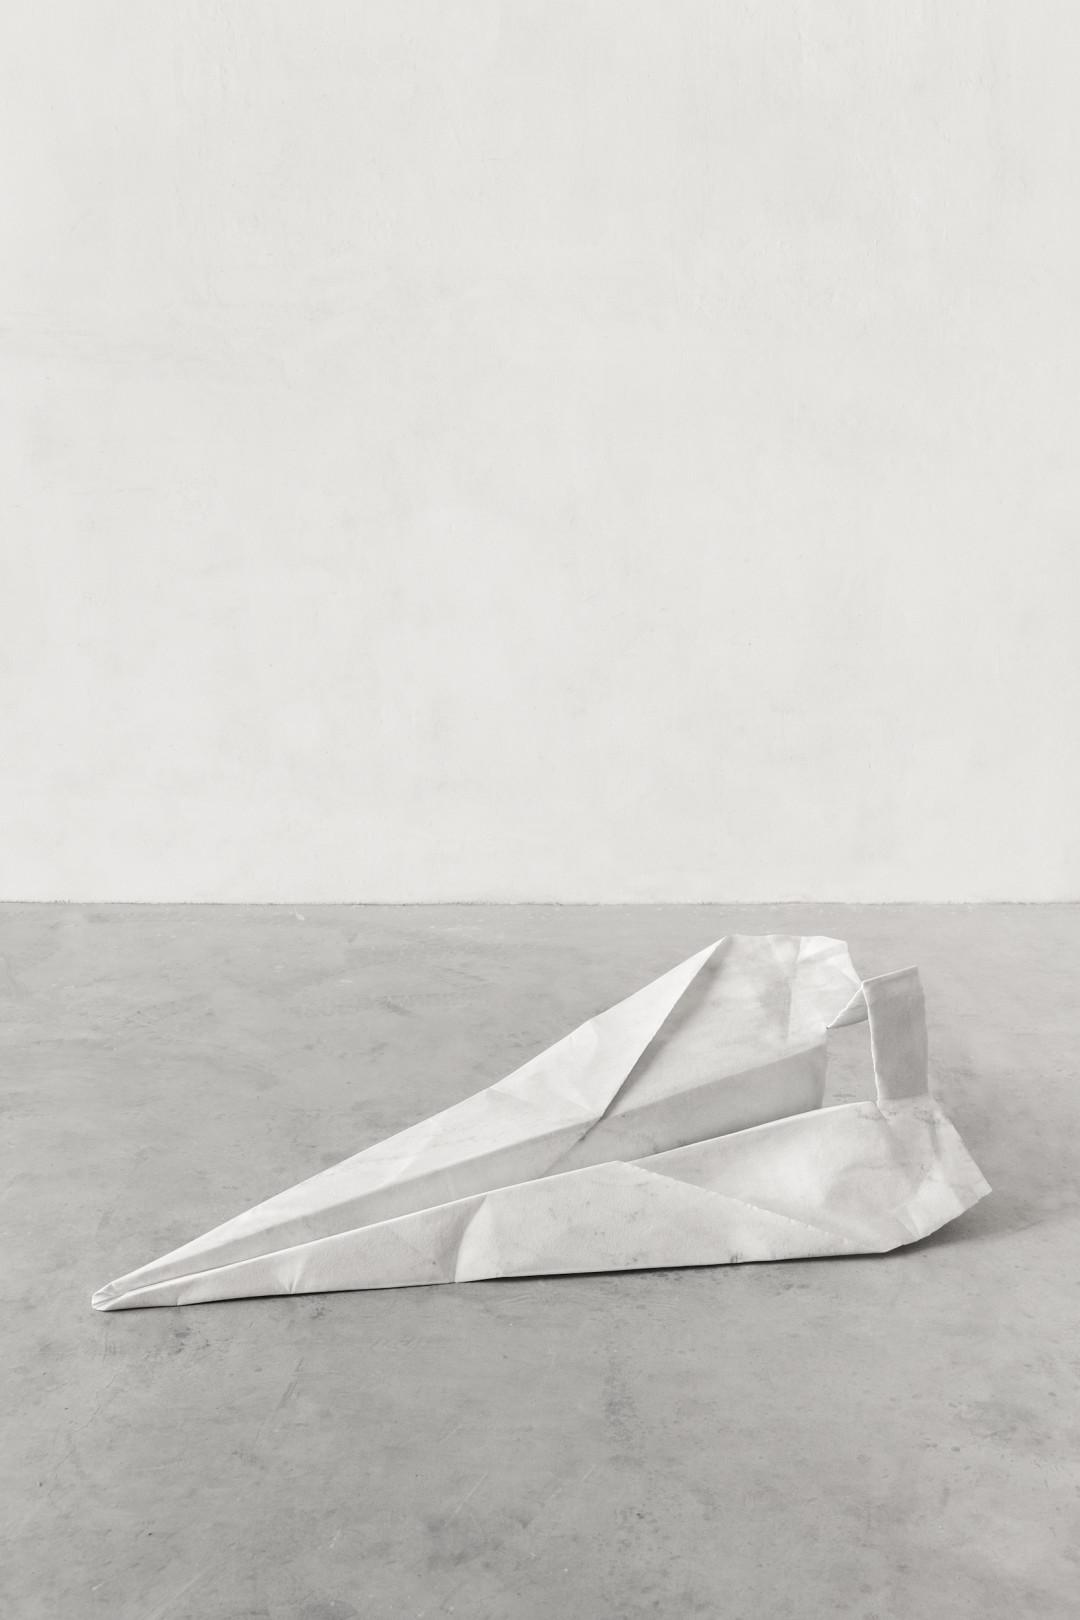 aereo-2015-marmo-bianco-cm-75x200x95-8796